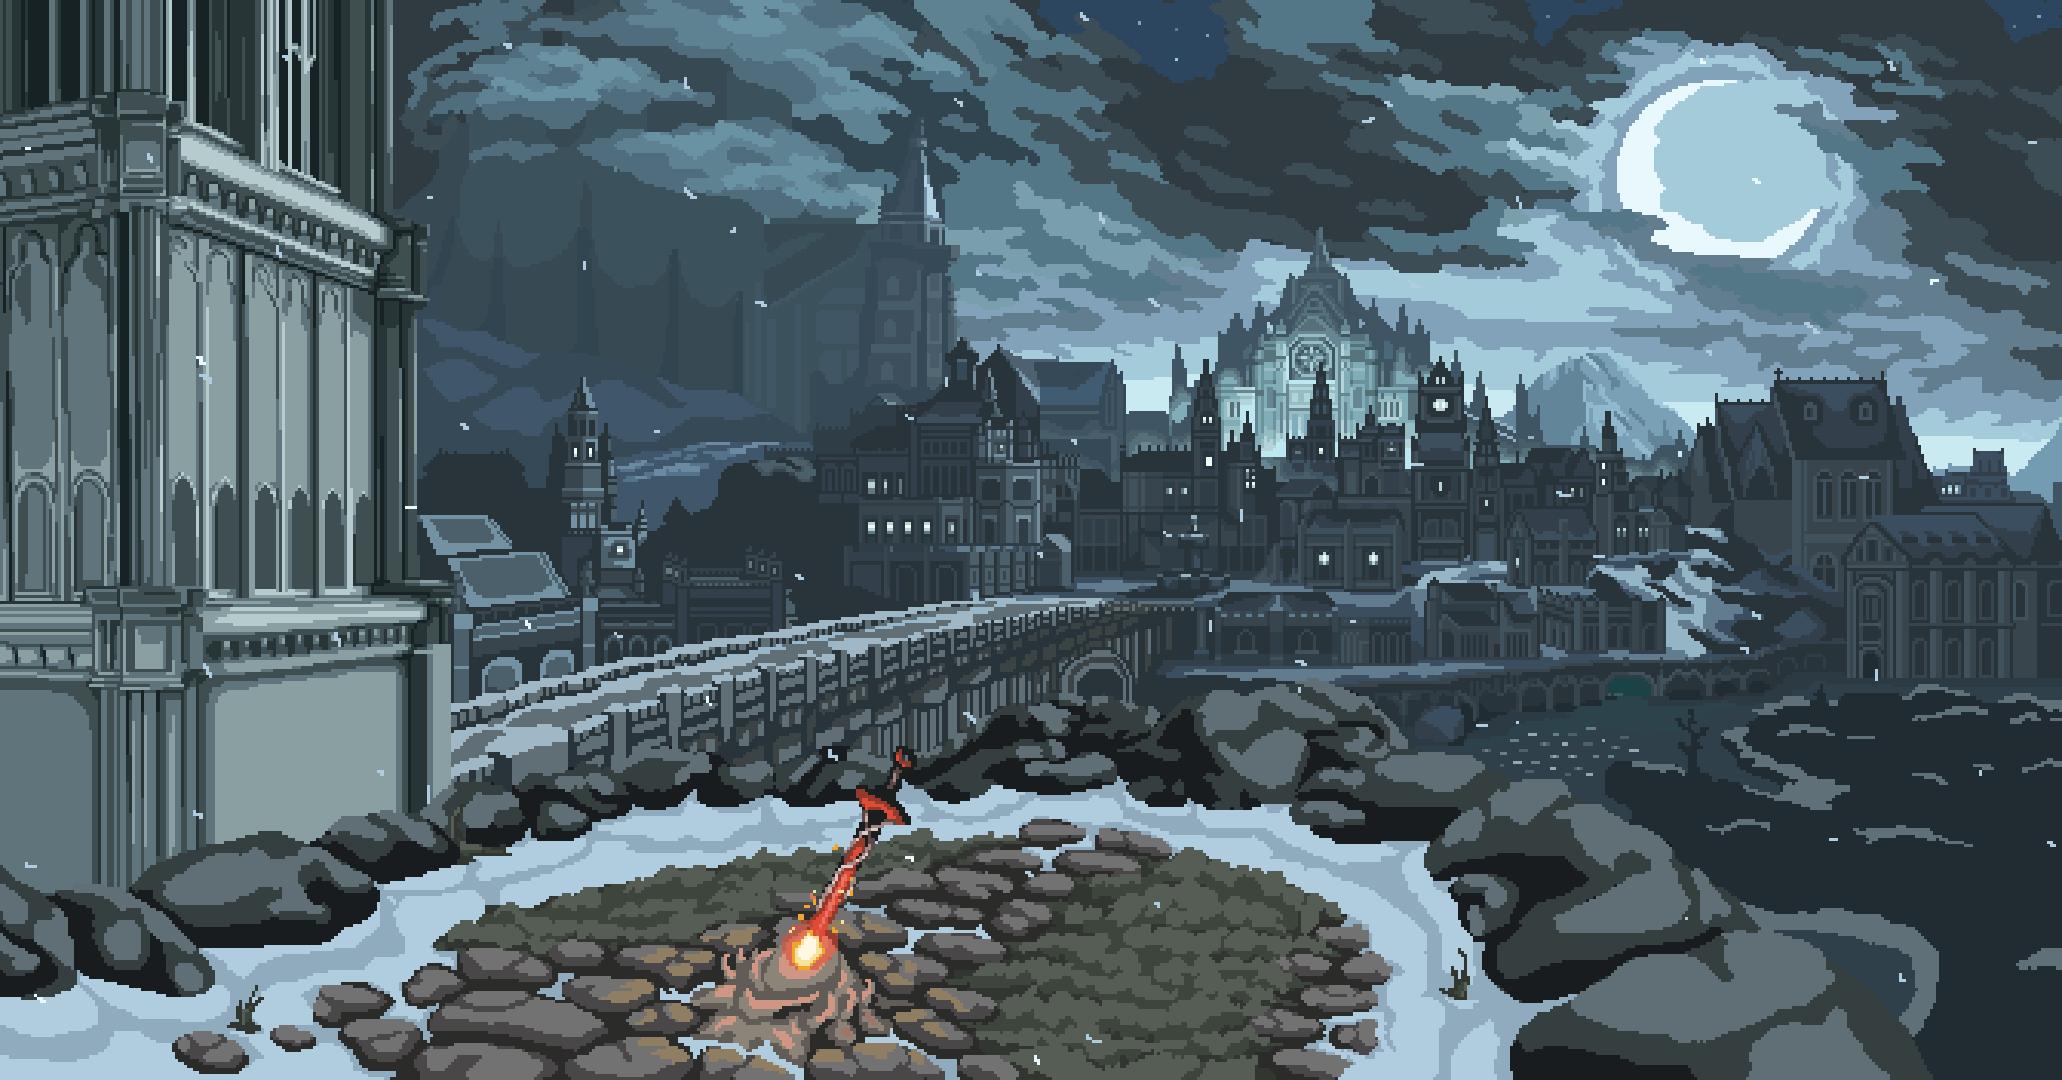 Wallpaper Landscape Digital Art Video Games Night Pixel Art